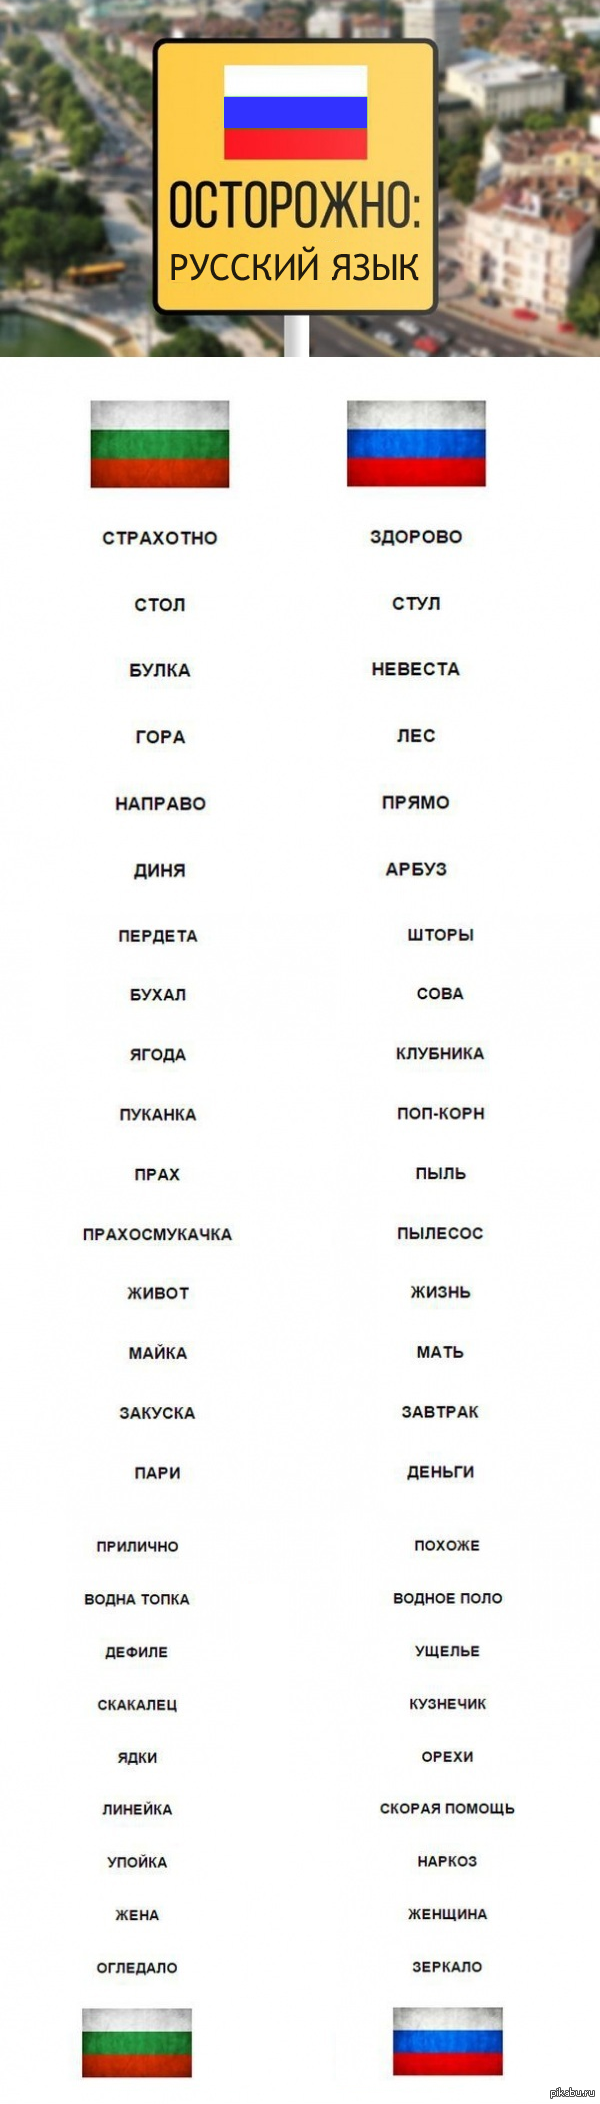 "Руски език - езика, на който е вярно точно обратното. В ответ на пост <a href=""http://pikabu.ru/story/bolgarskiy_yazyik__yazyik_v_kotorom_vse_naoborot_2773931"">http://pikabu.ru/story/_2773931</a>"